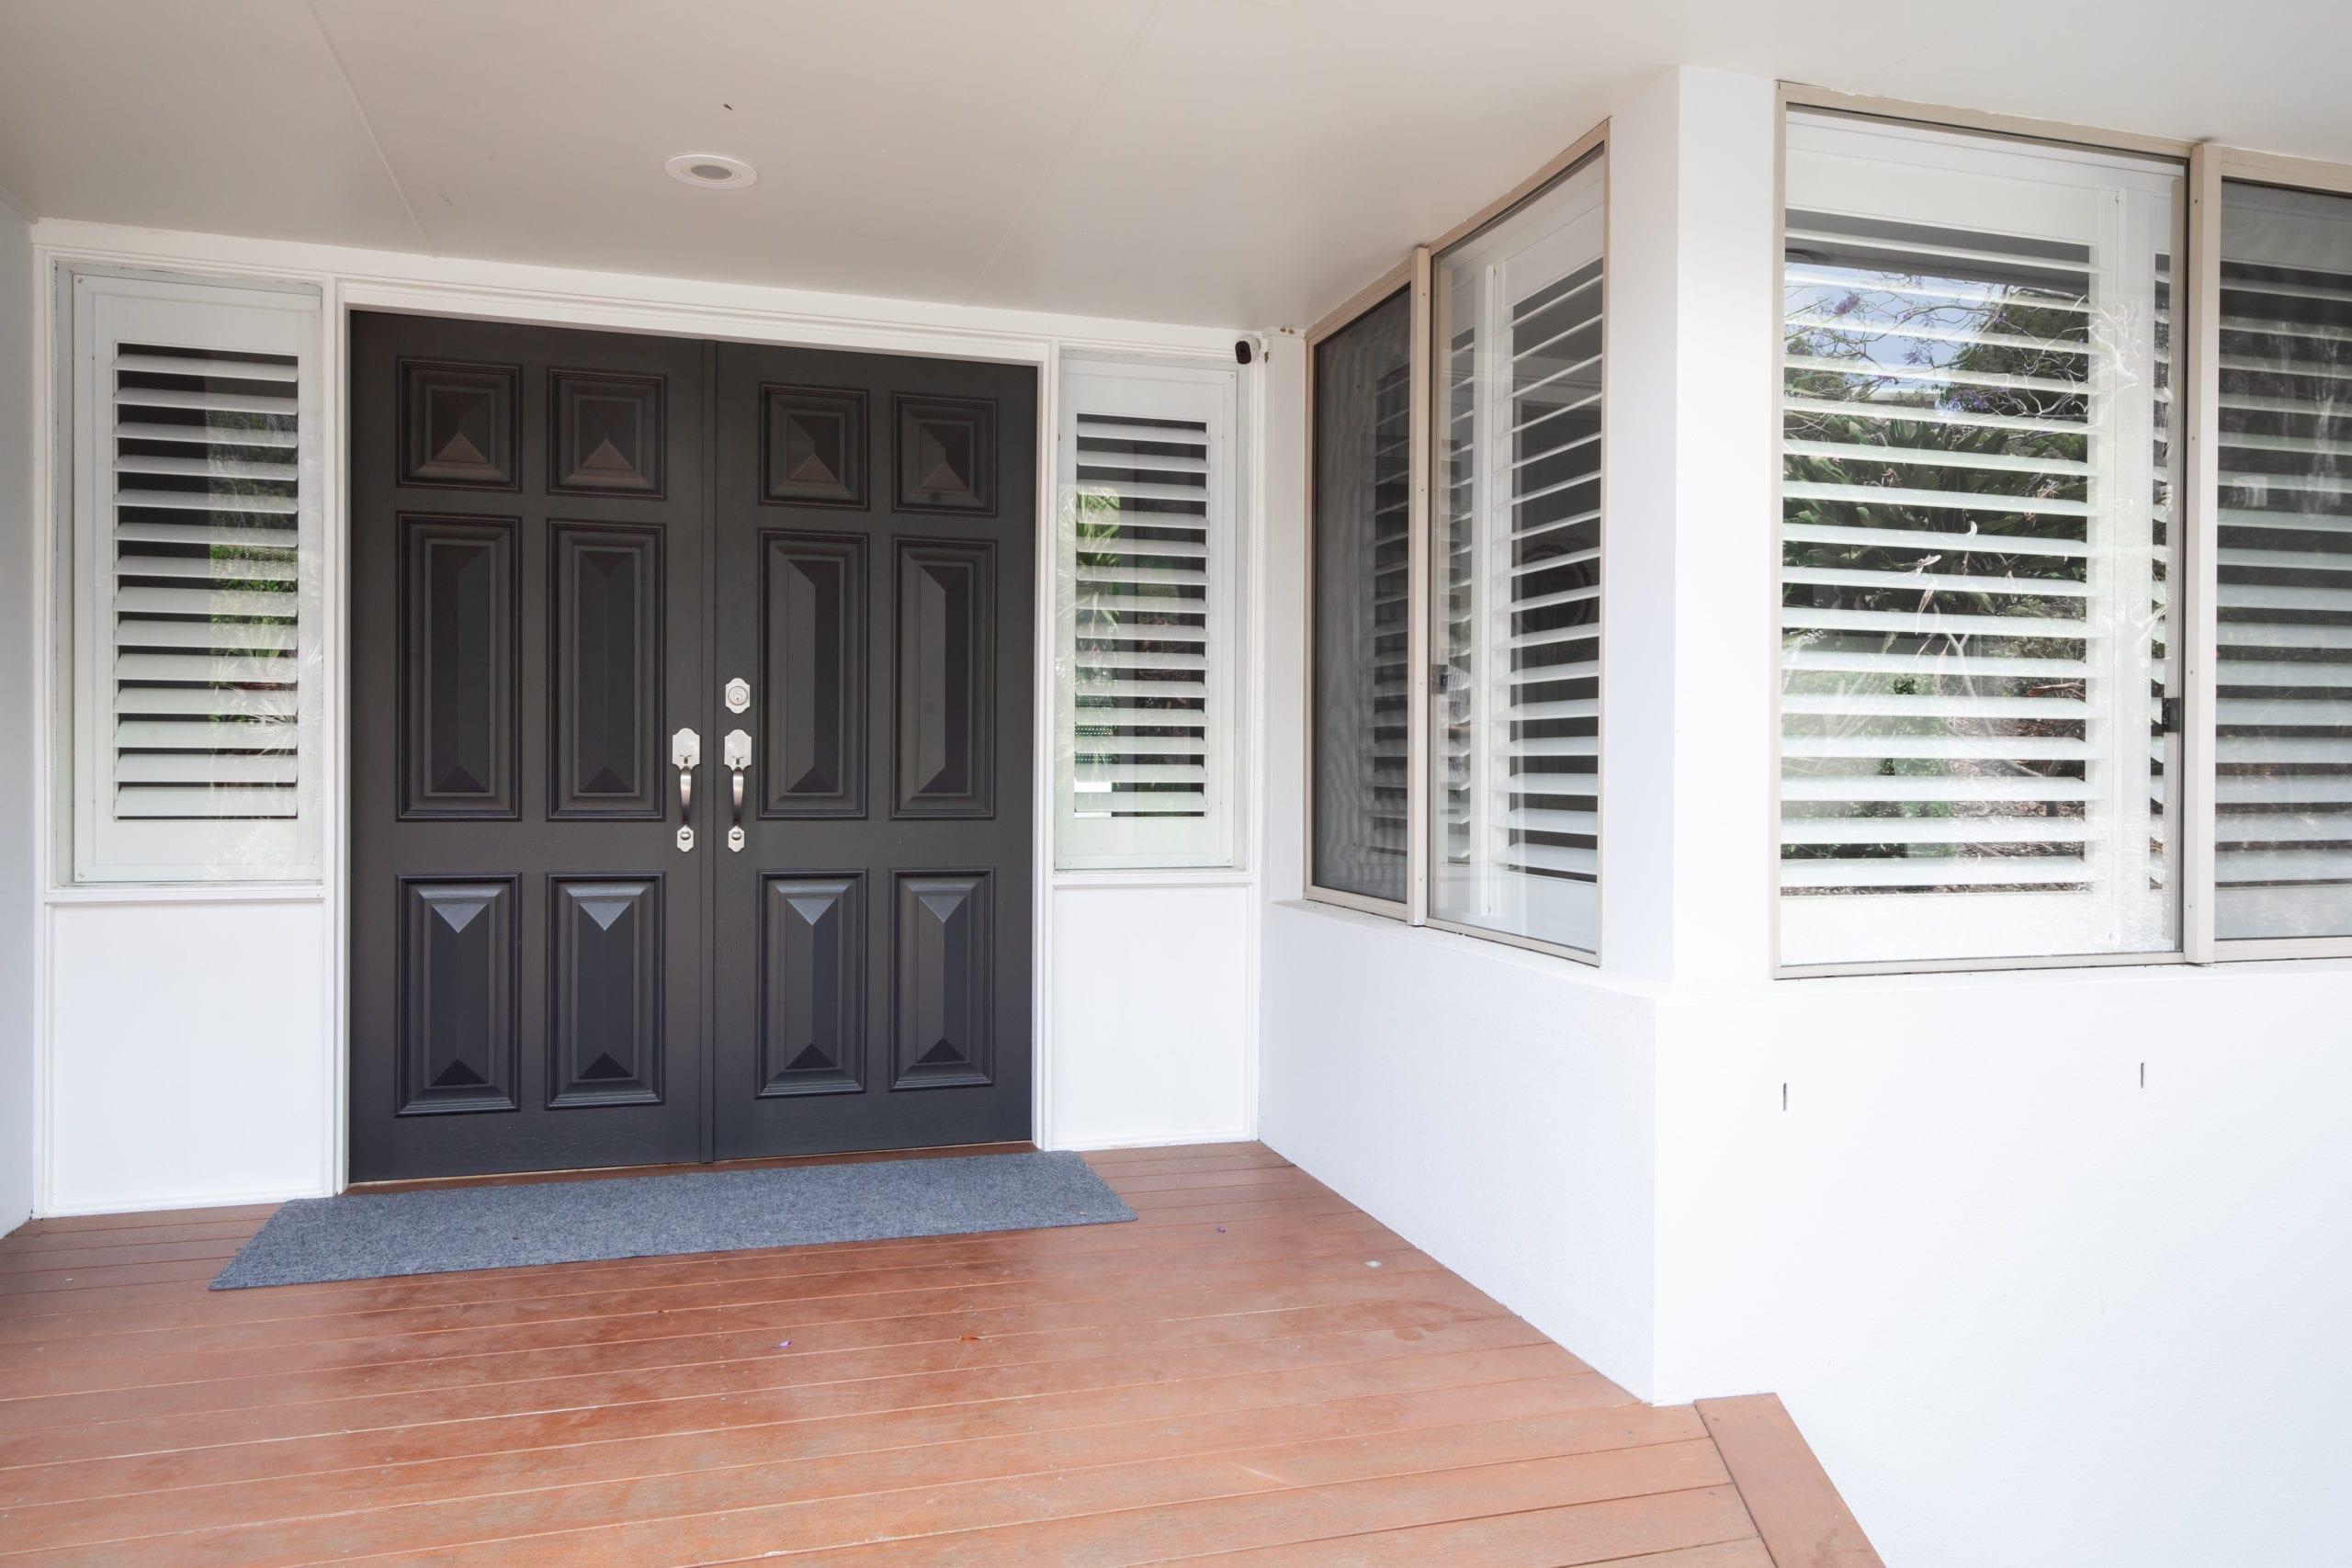 window plantation shutters interior sydney gold coast